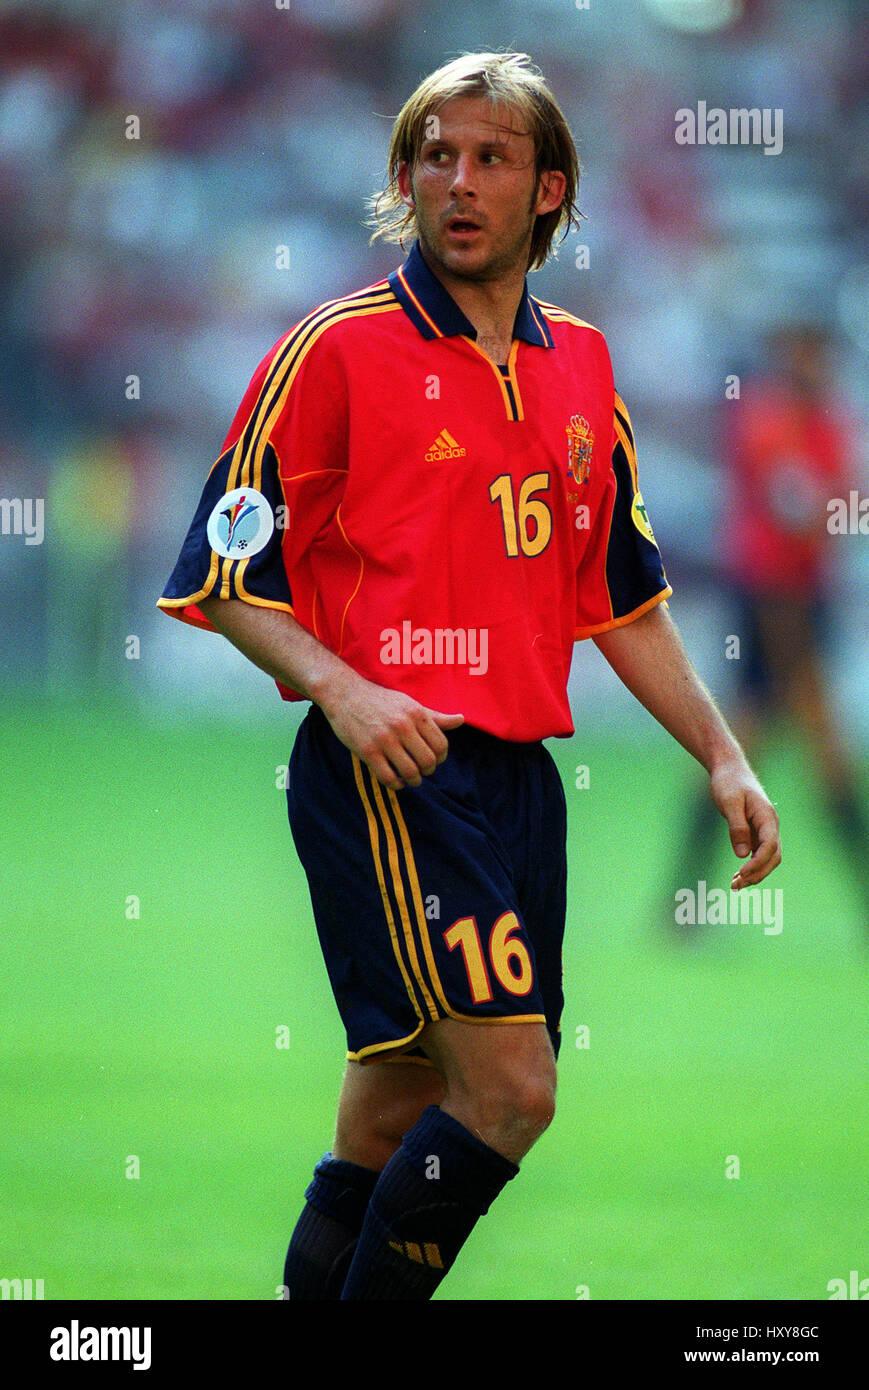 GAIZKA MENDIETA SPAIN CHARLEROI EURO 2000 18 June 2000 Stock